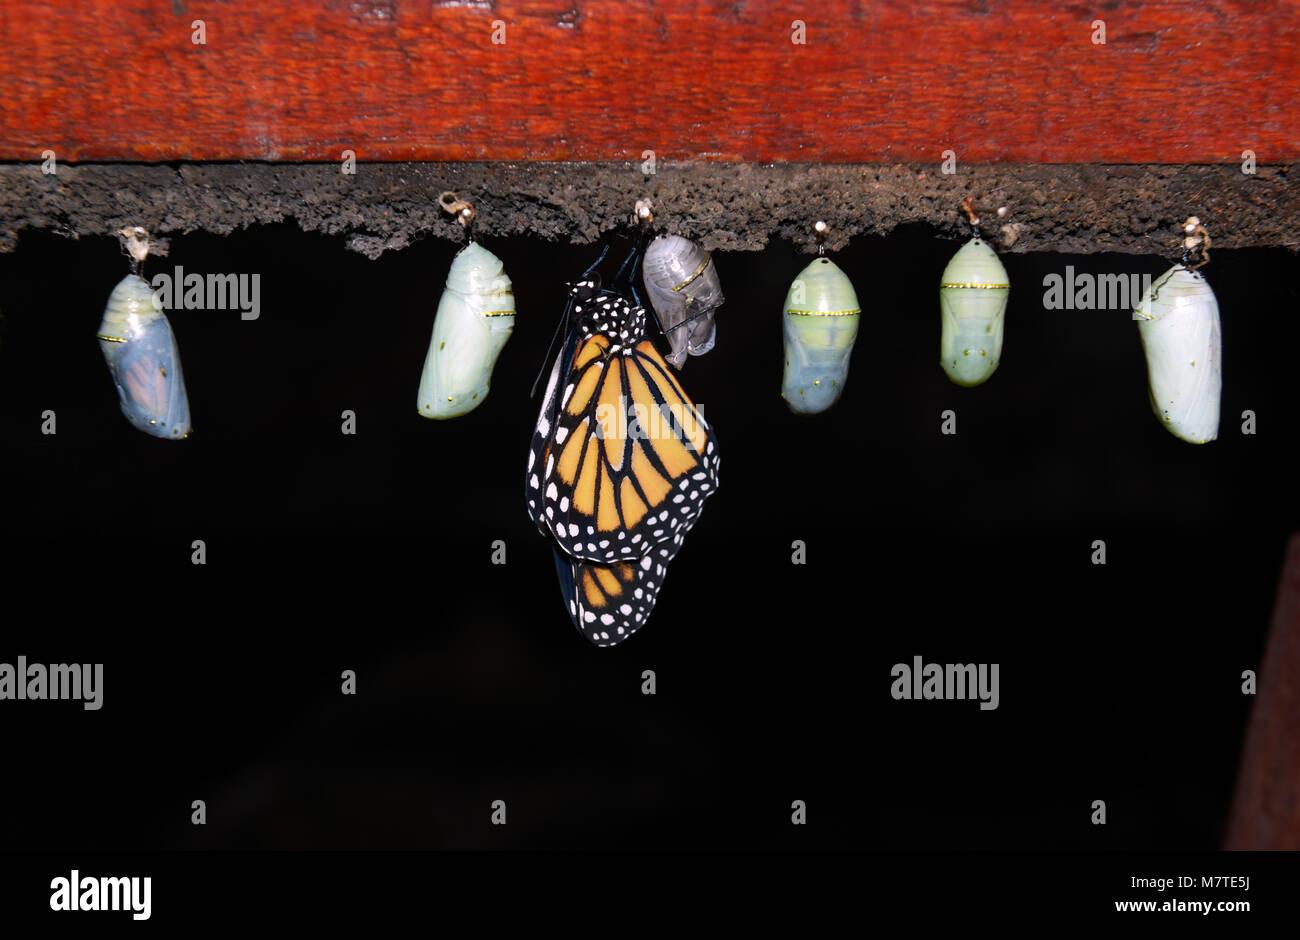 Monarch butterfly, Danaus plexippus, emerging from chrysalis, butterfly farm, La Paz waterfall gardens, Costa Rica - Stock Image